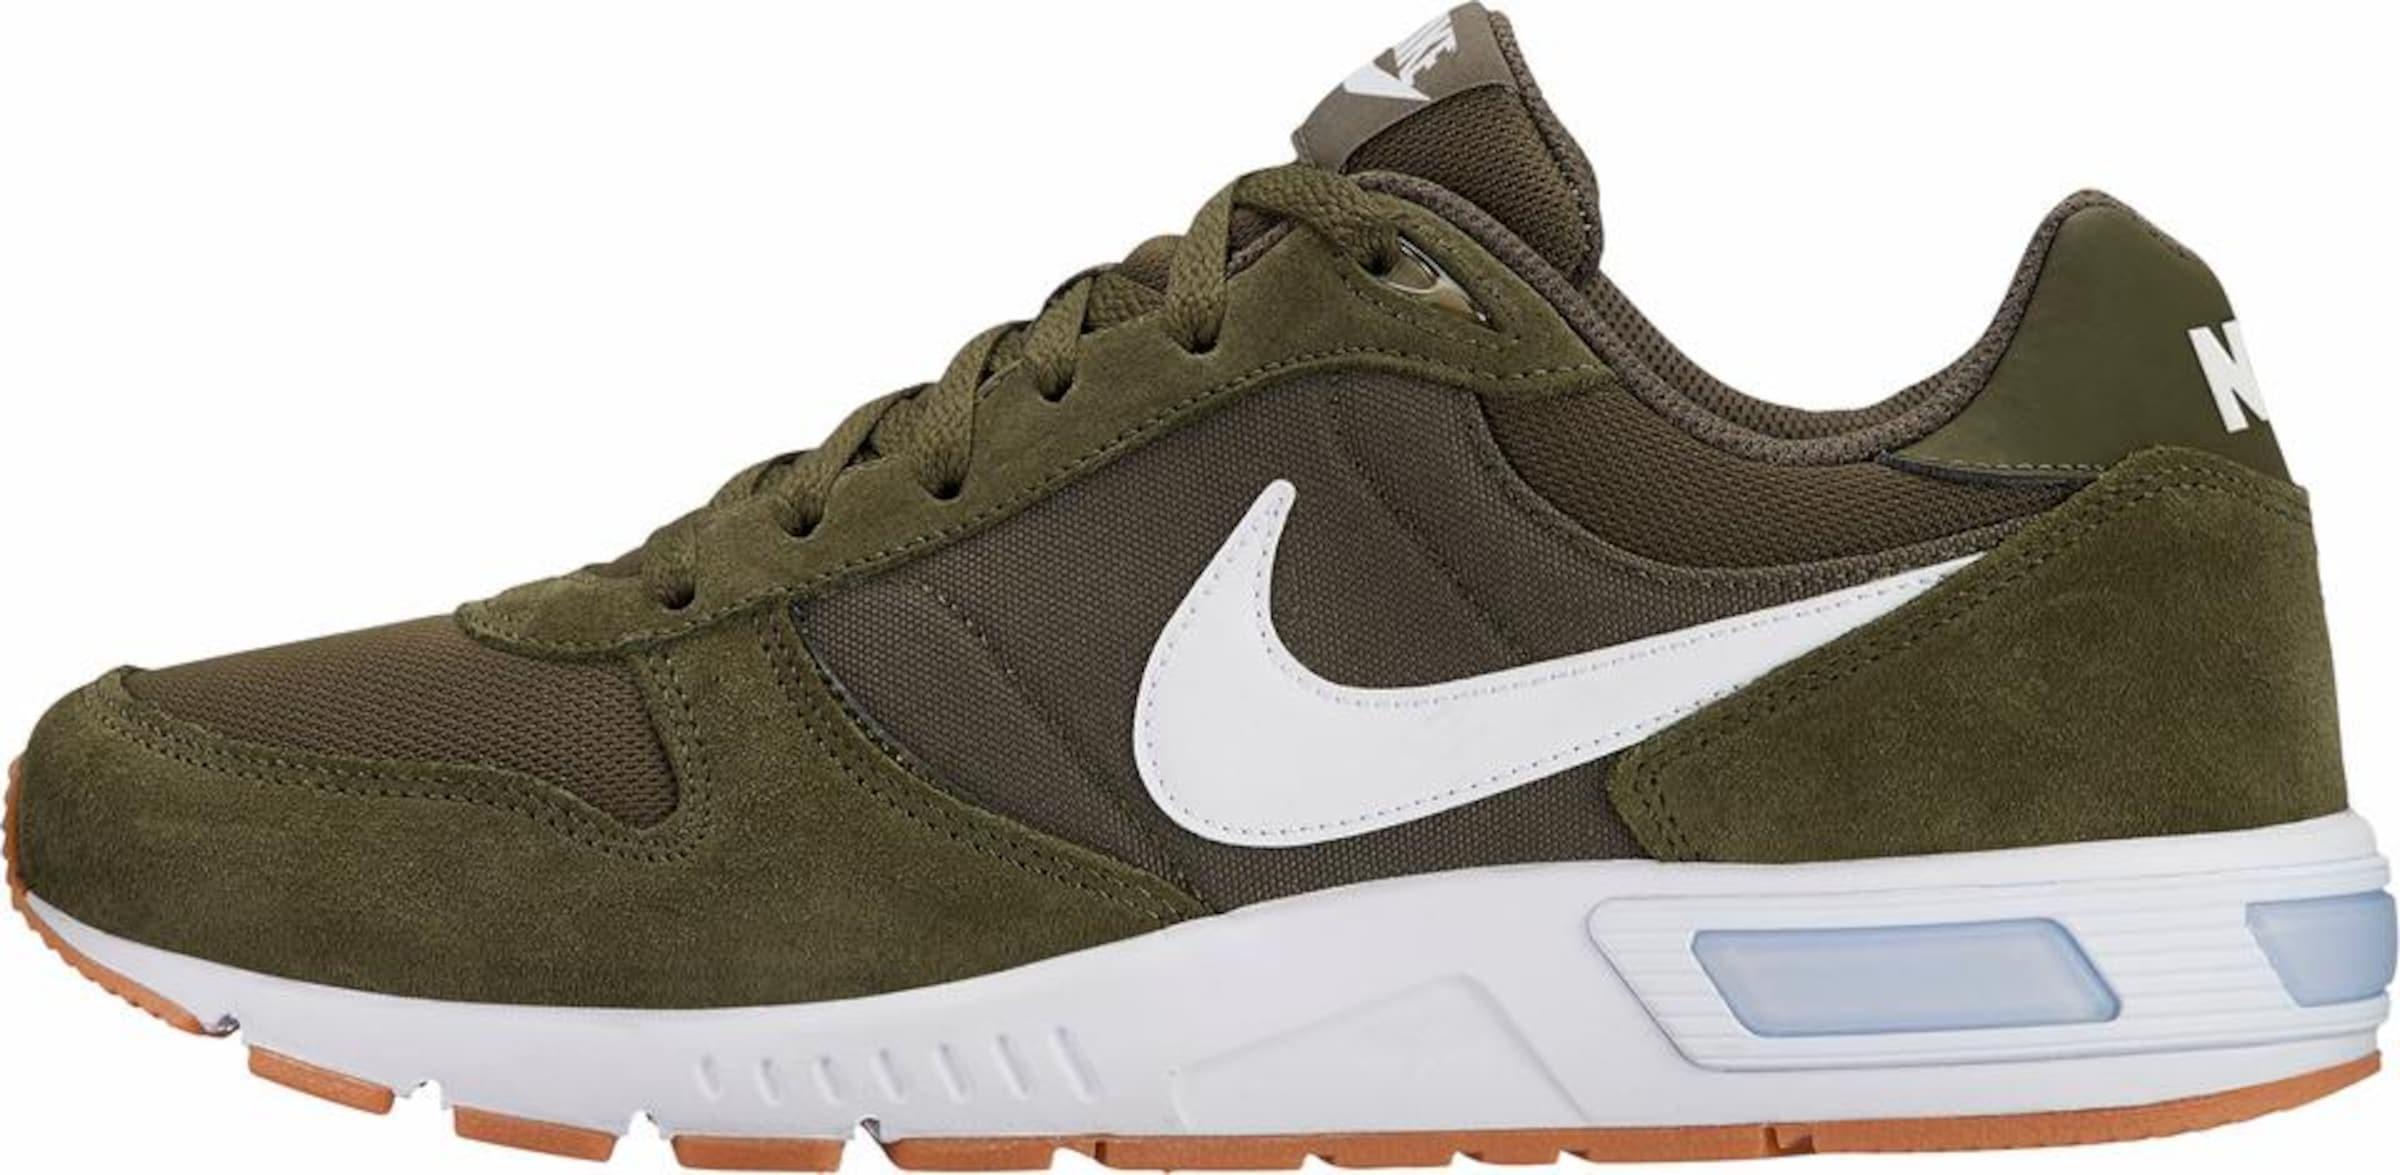 Nike Sportswear Nightgazer Sneaker Verschleißfeste billige Schuhe